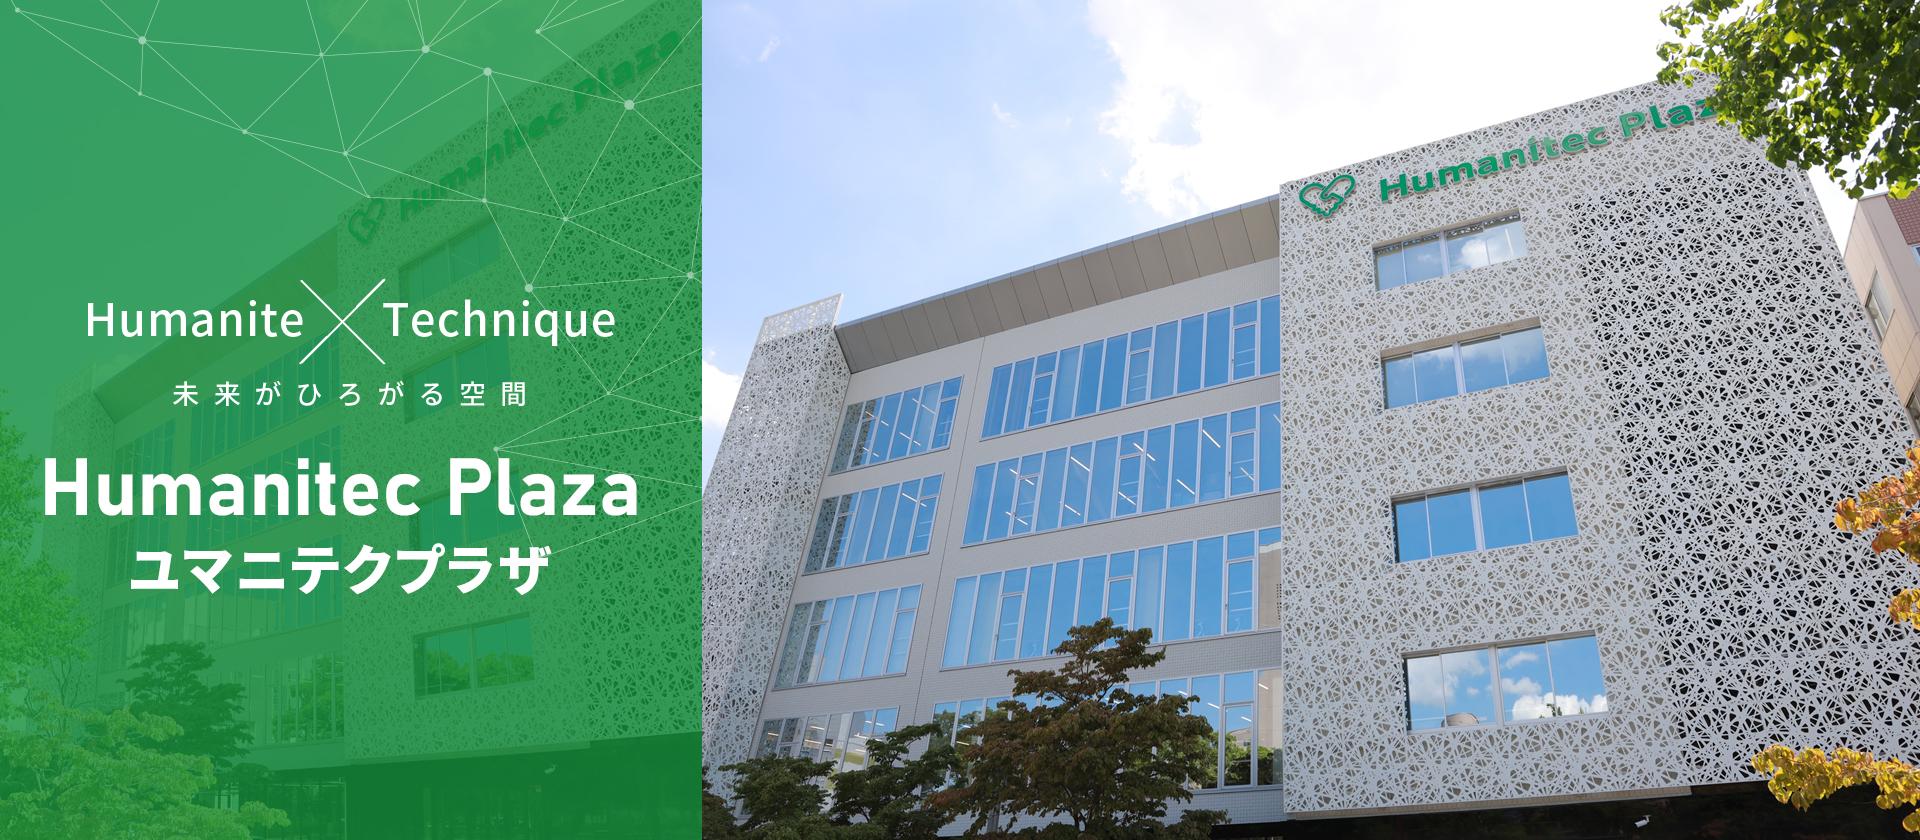 Humanitec Plaza ユマニテクプラザ